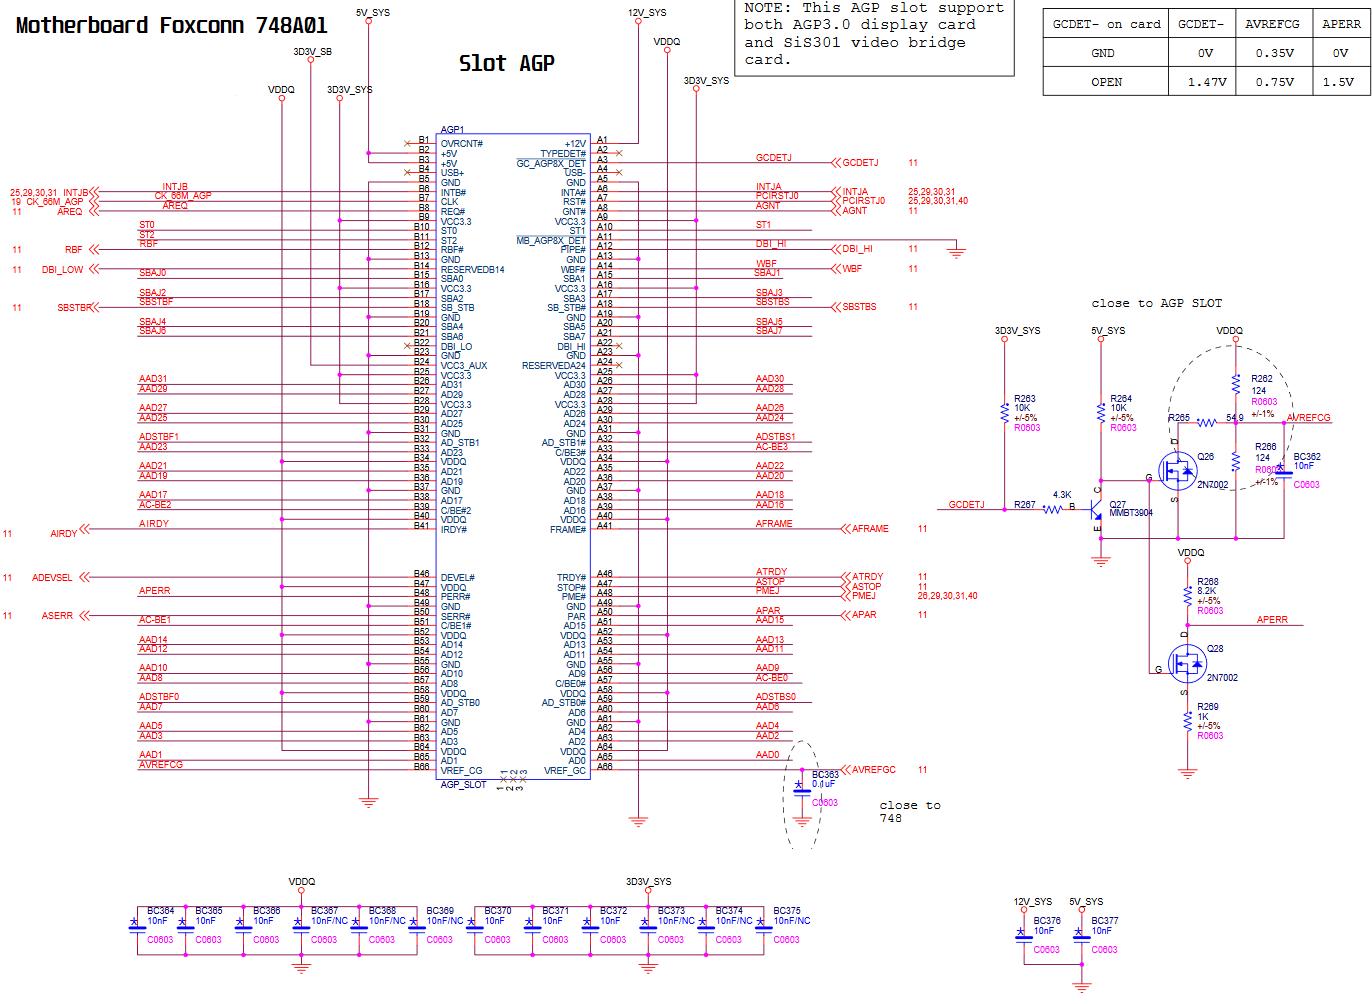 AGP slot - Foxconn 748A01